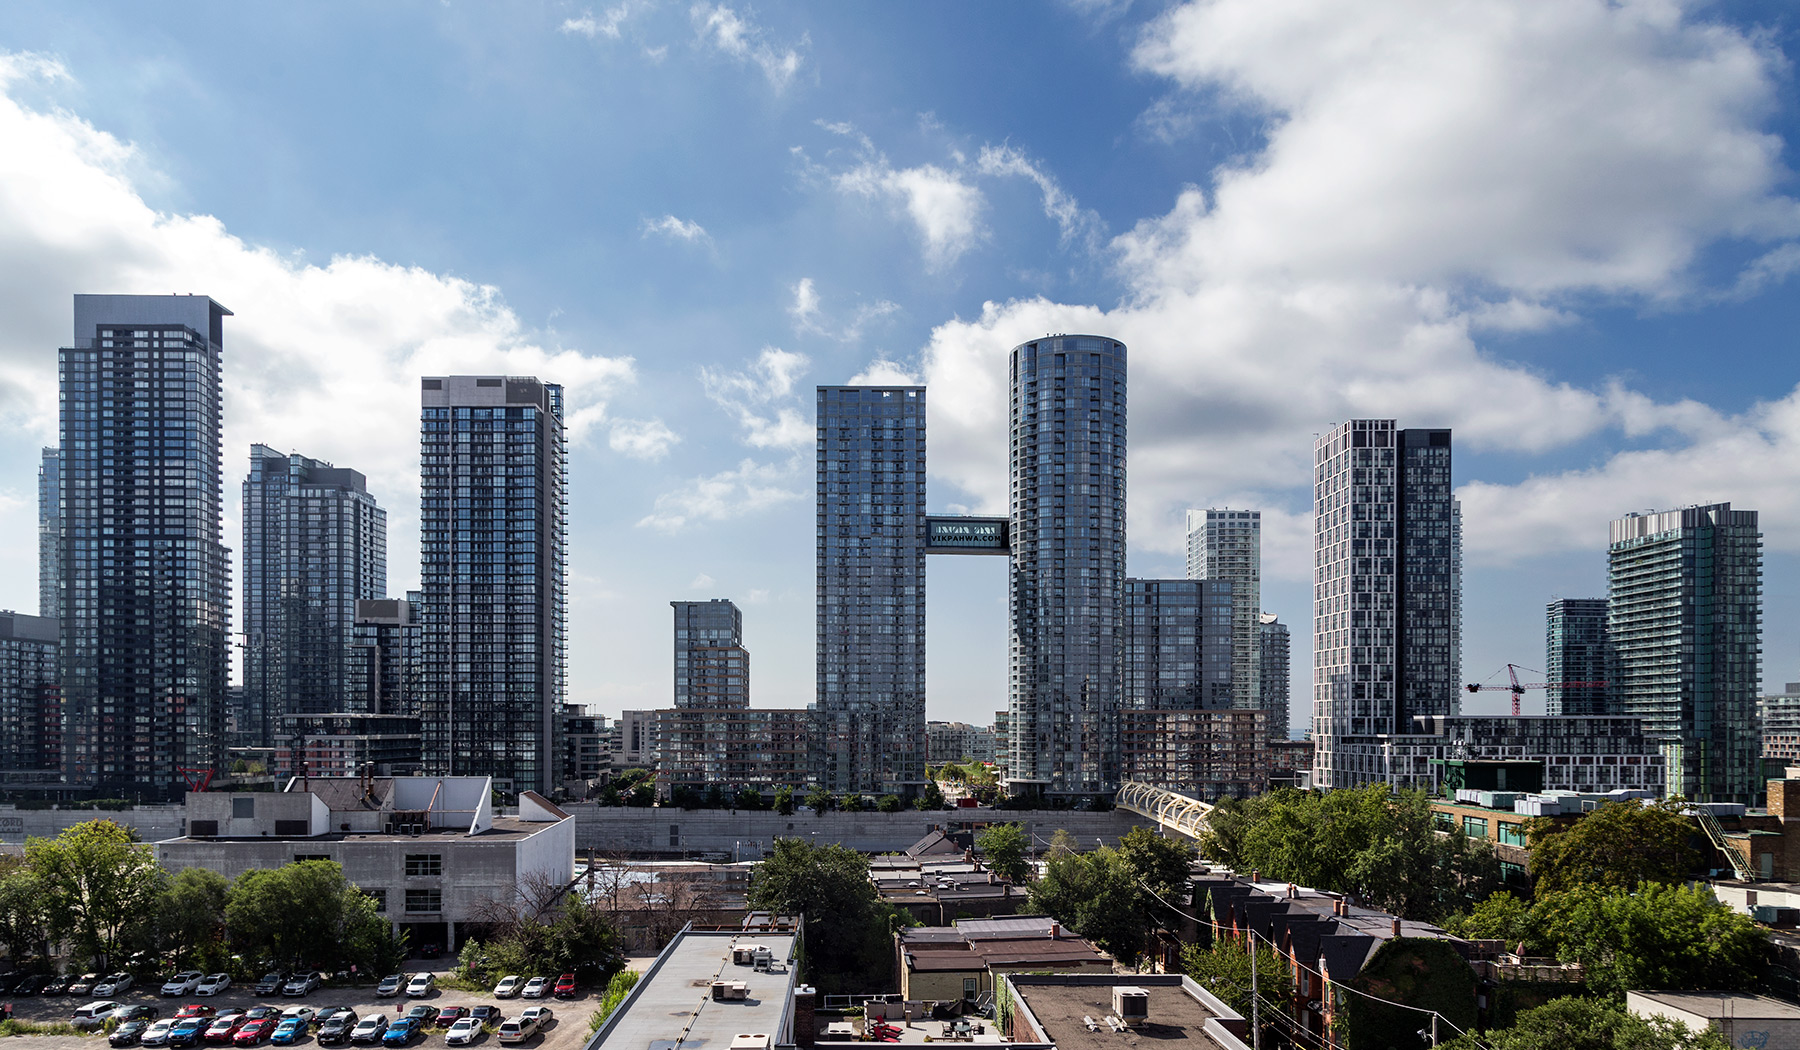 20160819. Toronto's CityPlace skyline.